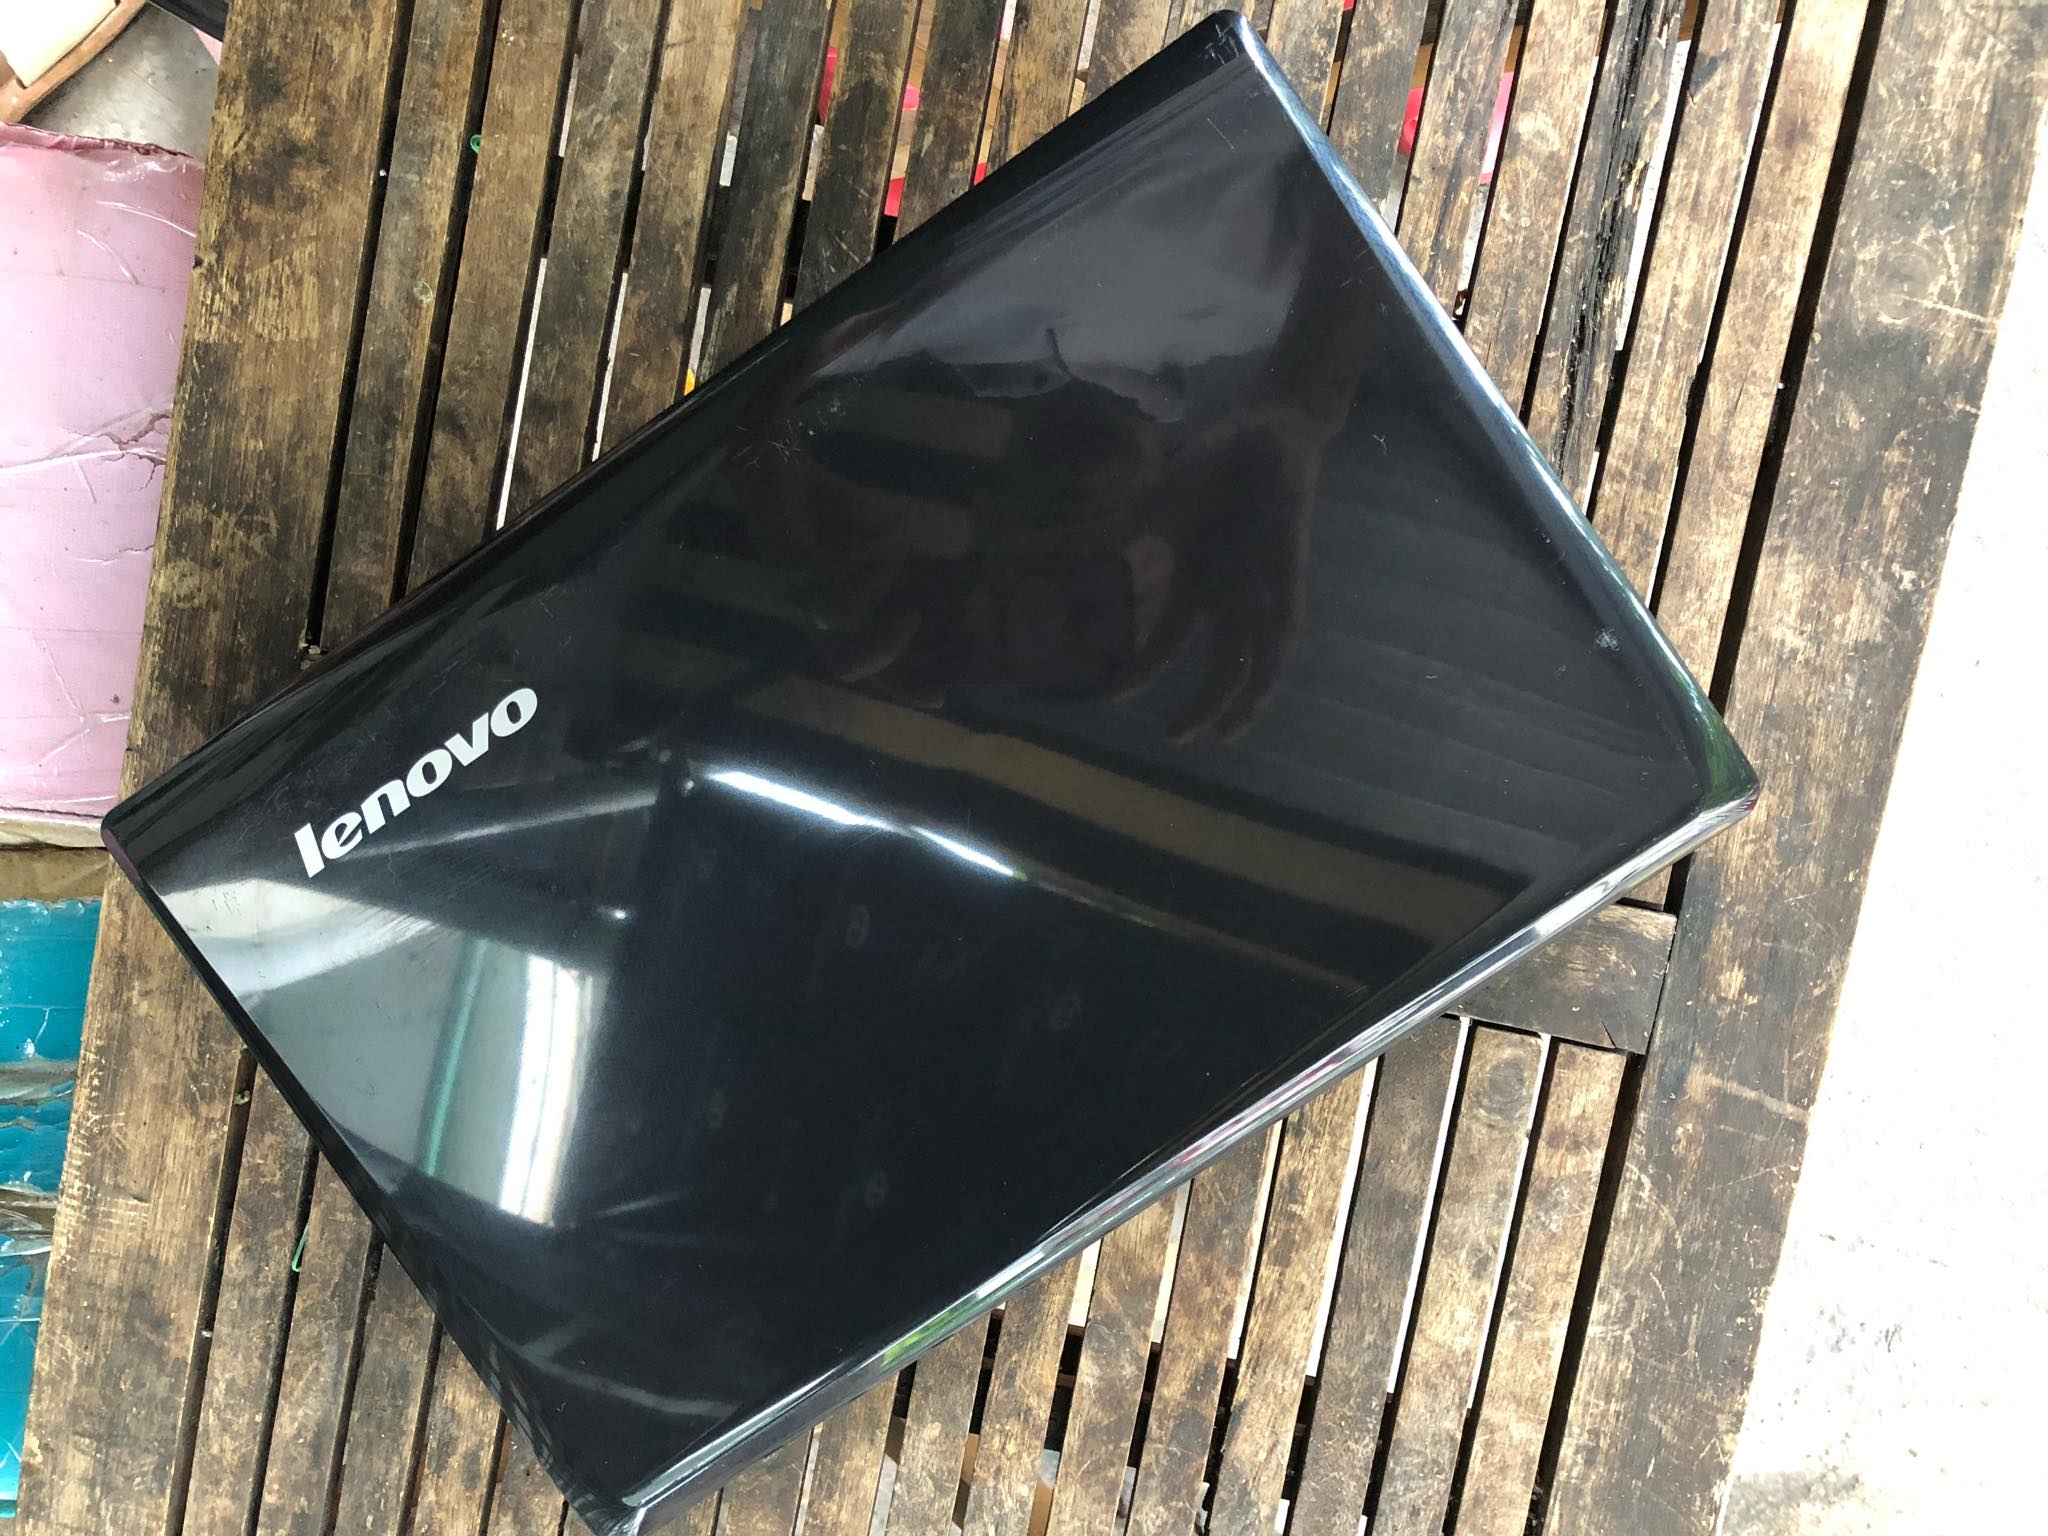 Lenovo G560 Core i5 M430 Ram 4GB HDD 500GB 15.6inch